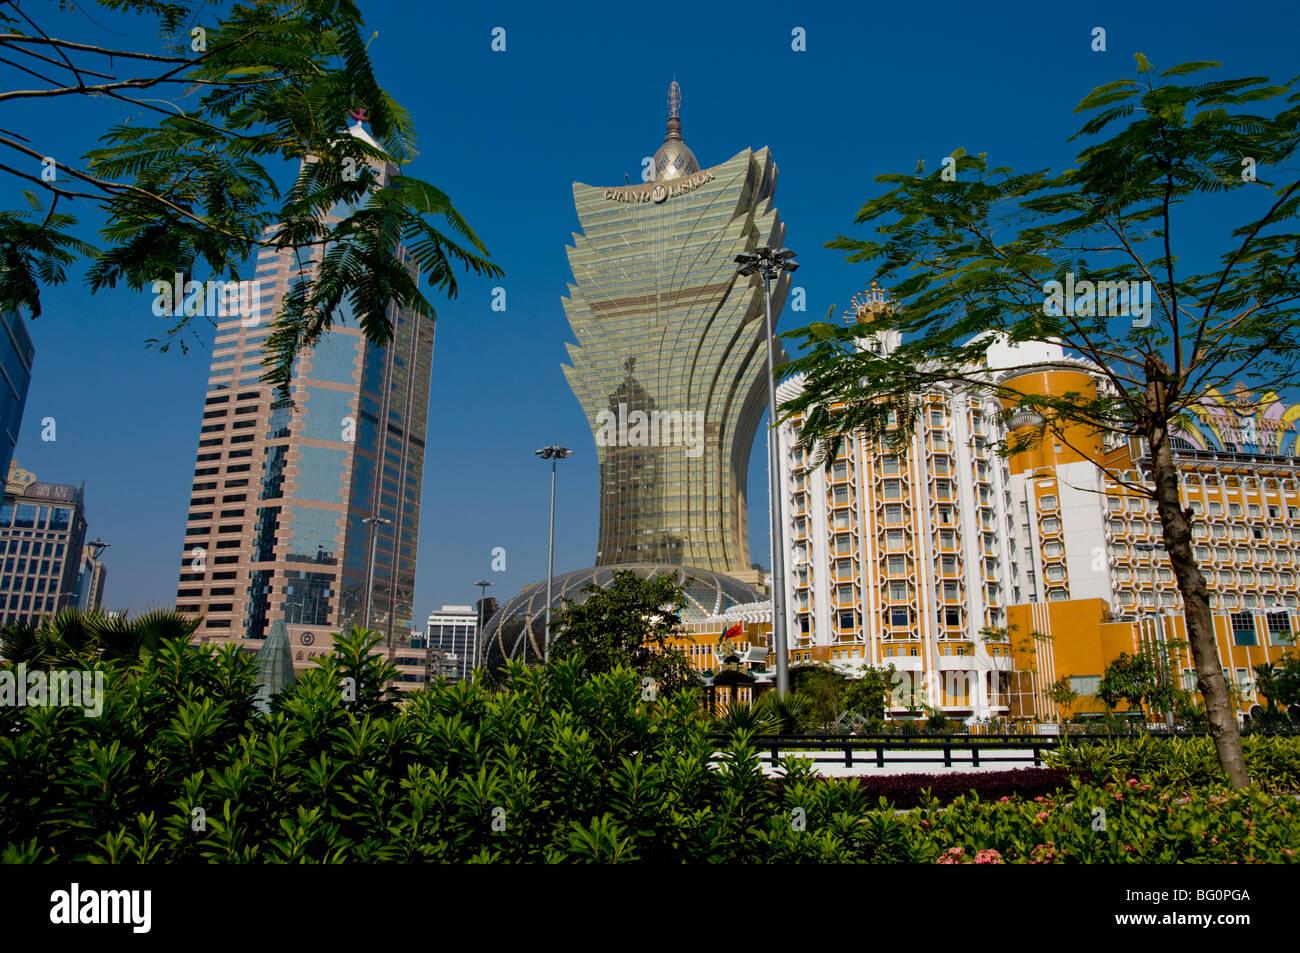 Gran Casino Lisboa, Macao, China, Asia Imagen De Stock